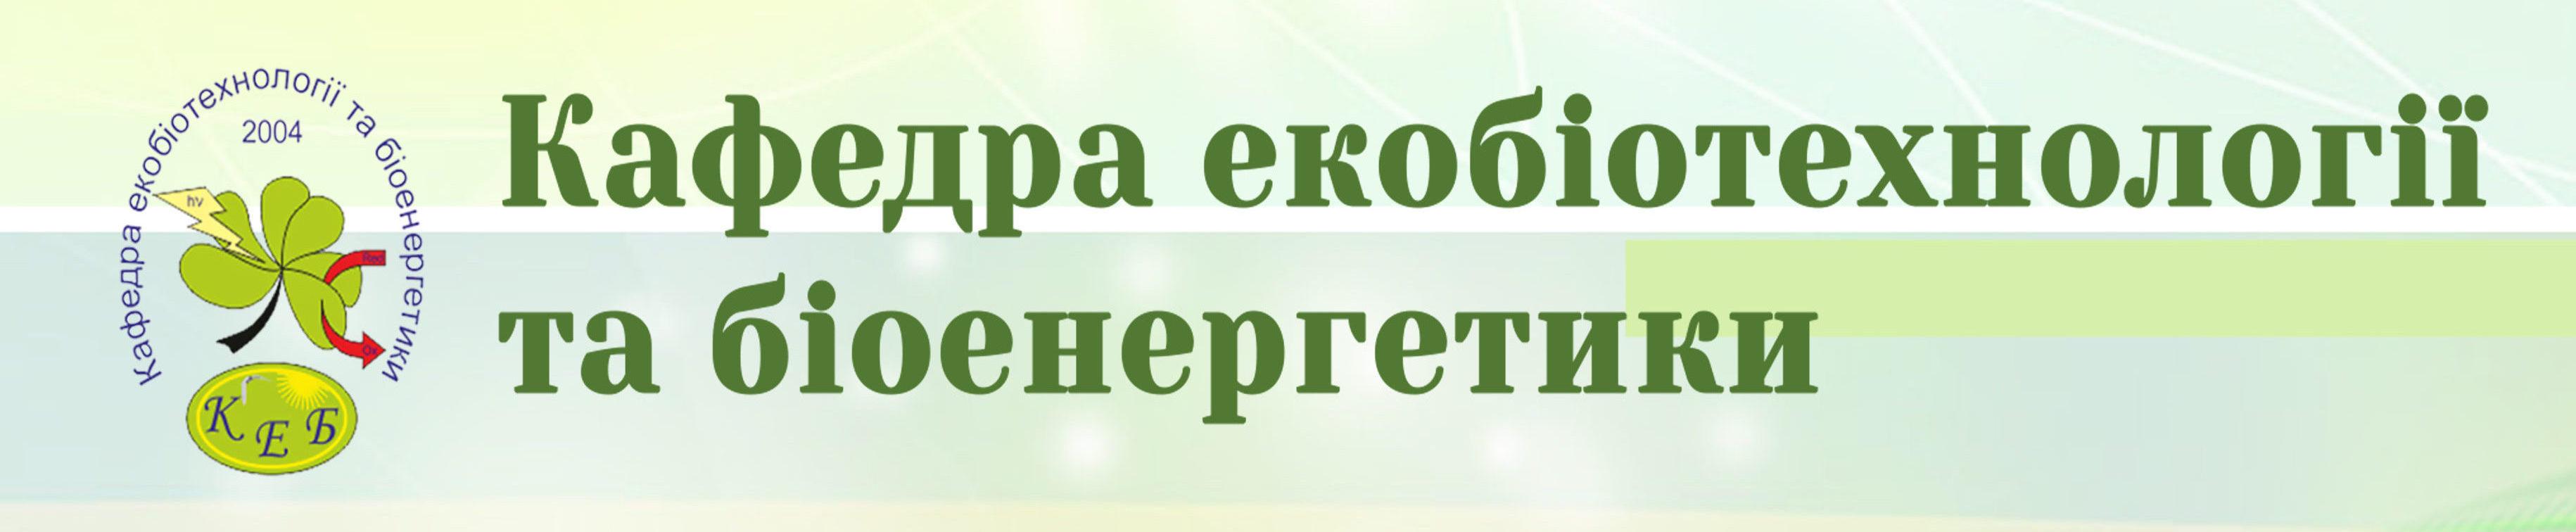 Кафедра КЕБ